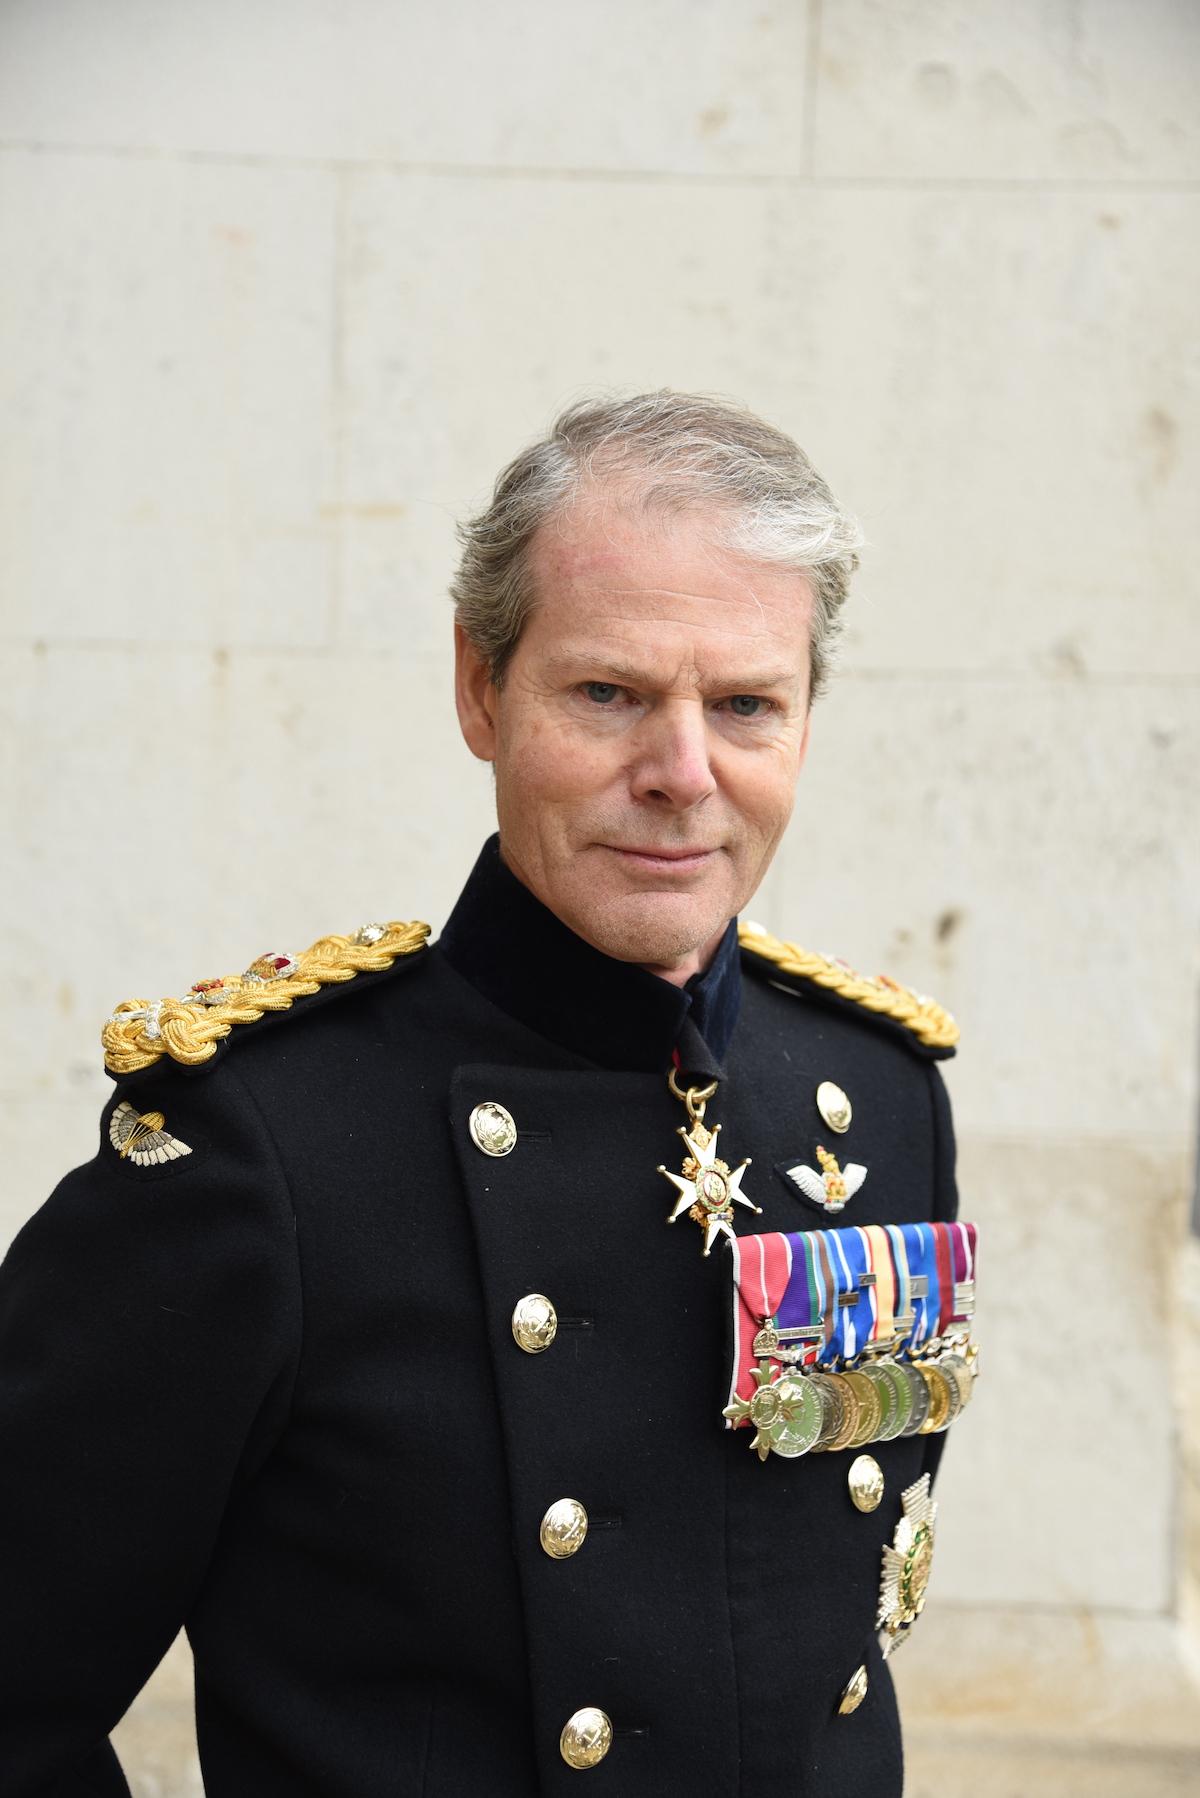 Governor Sir General Adrian Bradshaw, KCB OBE DL